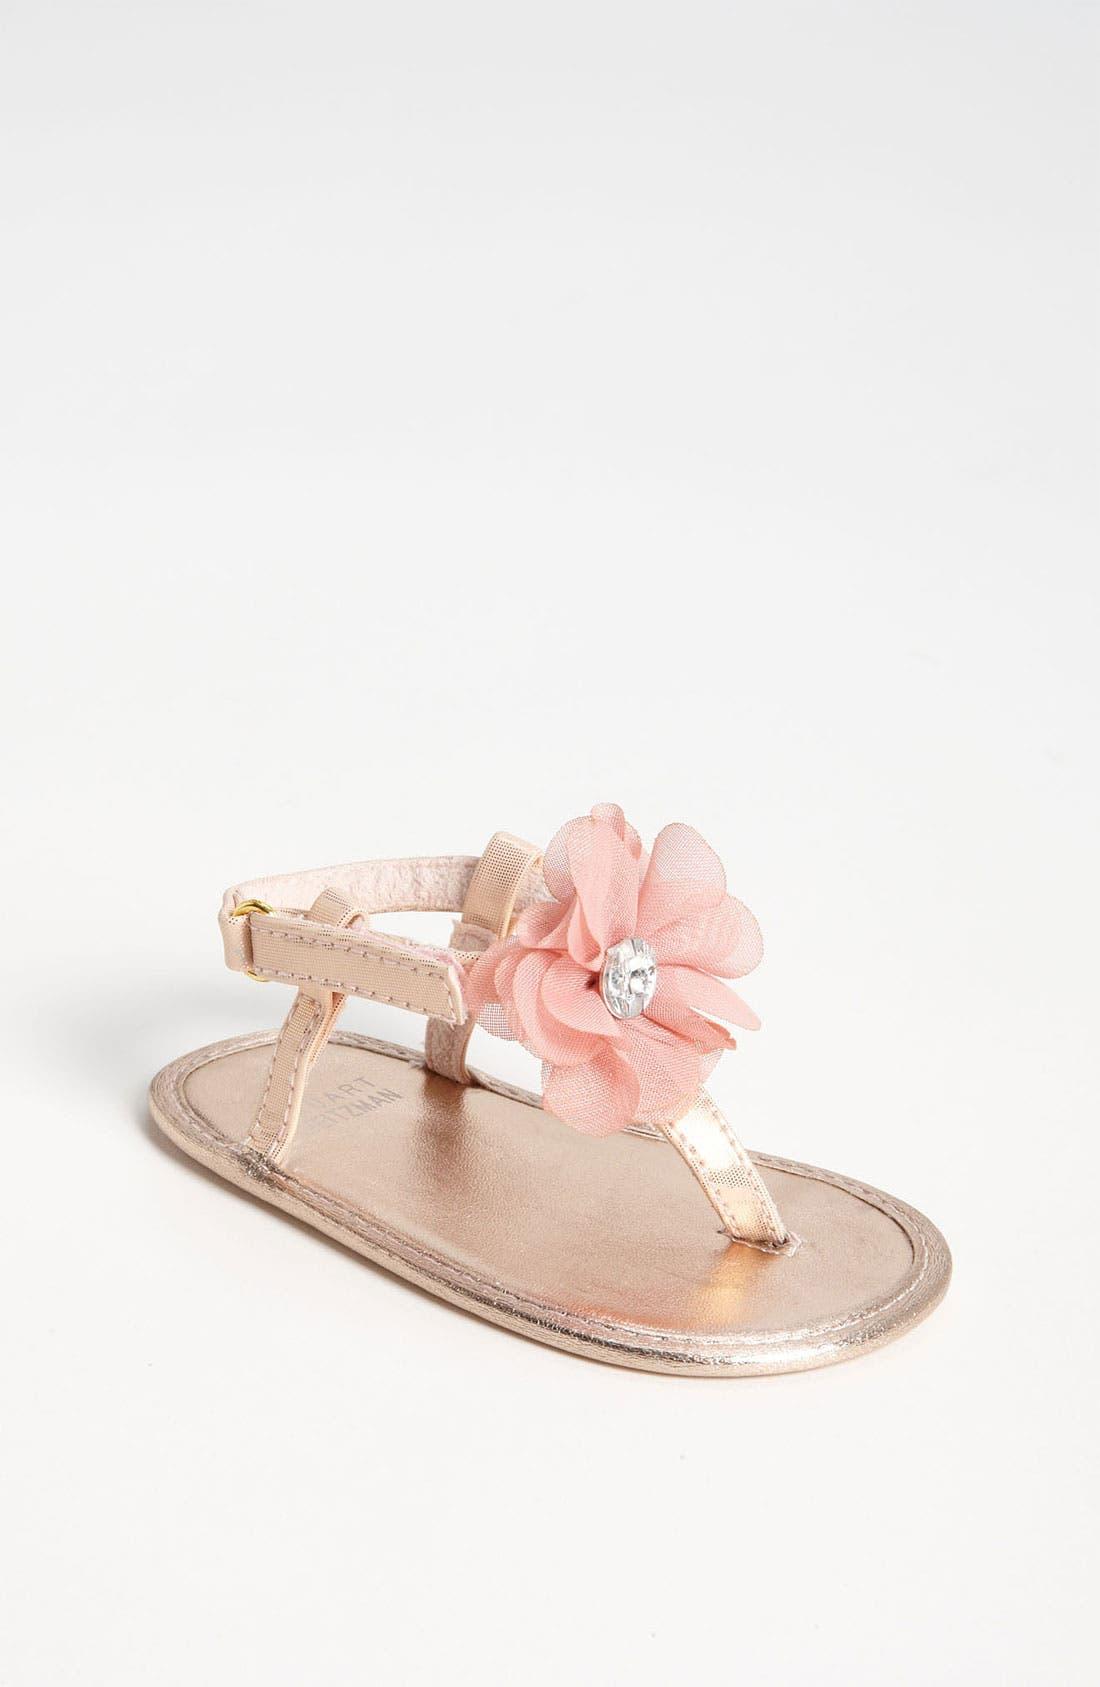 Alternate Image 1 Selected - Stuart Weitzman 'Baby Silk' Sandal (Baby)